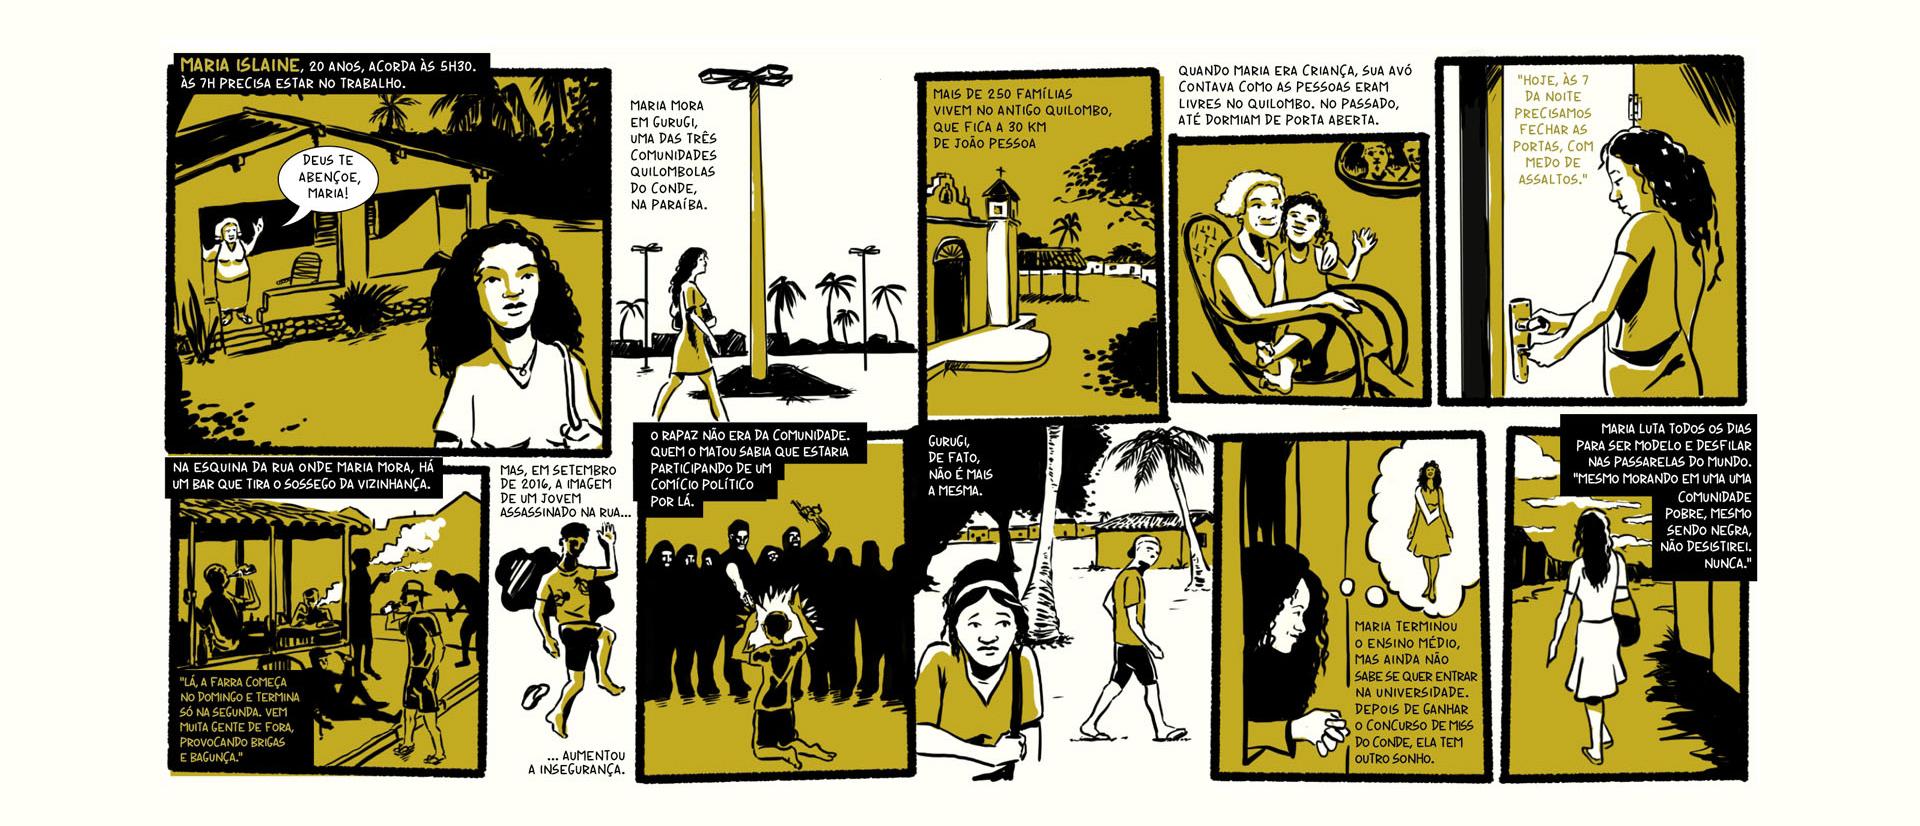 Rica Ramos/Eder Content